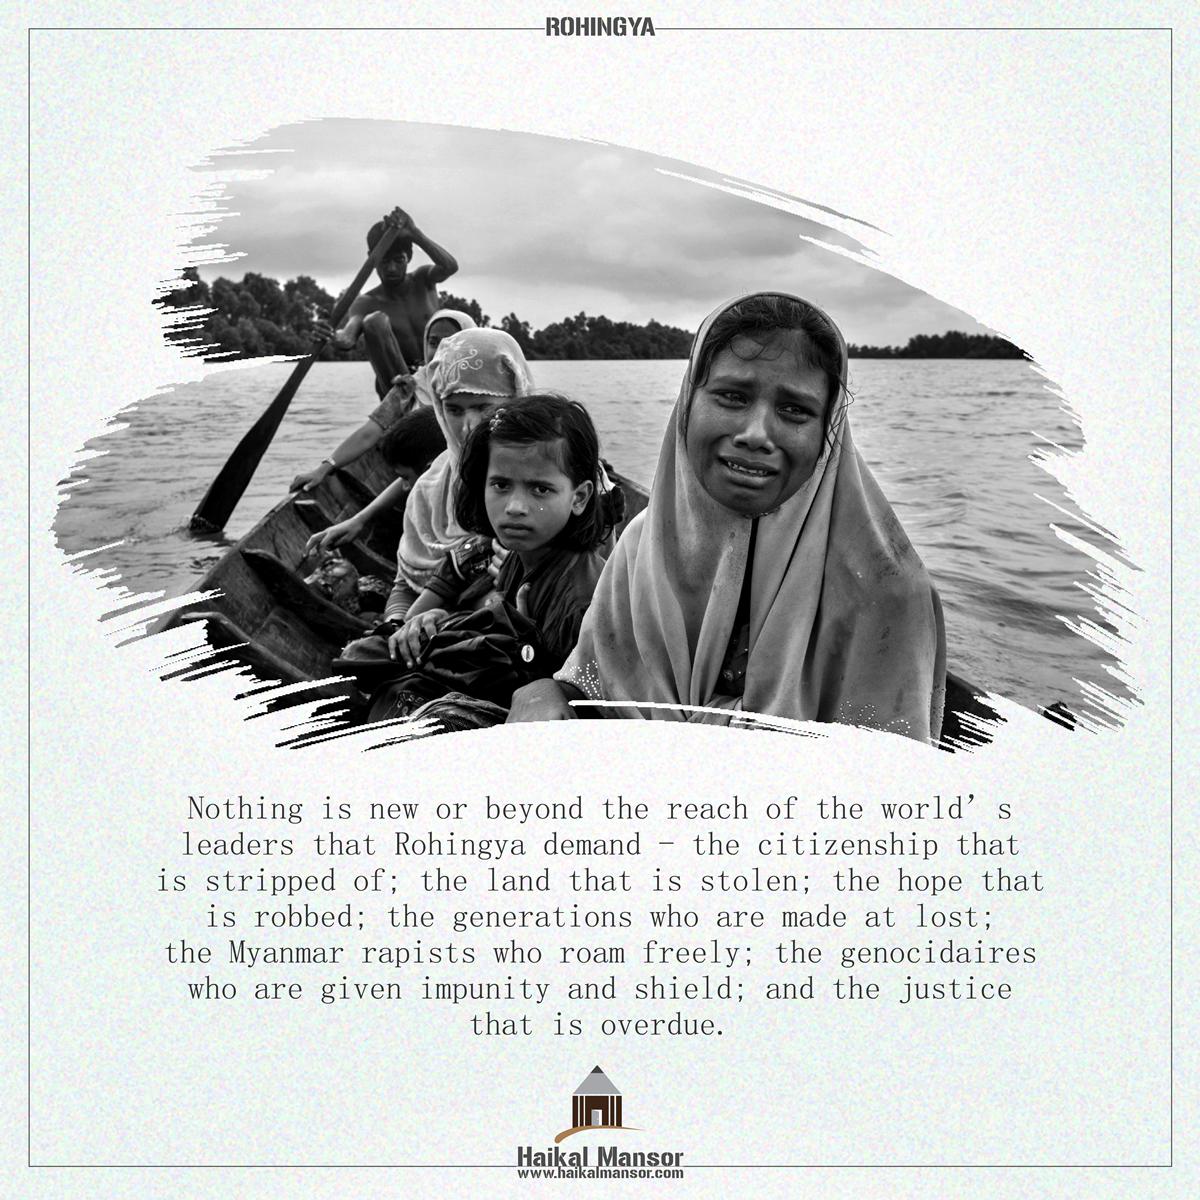 Justice overdue - Rohingya-01-01-01